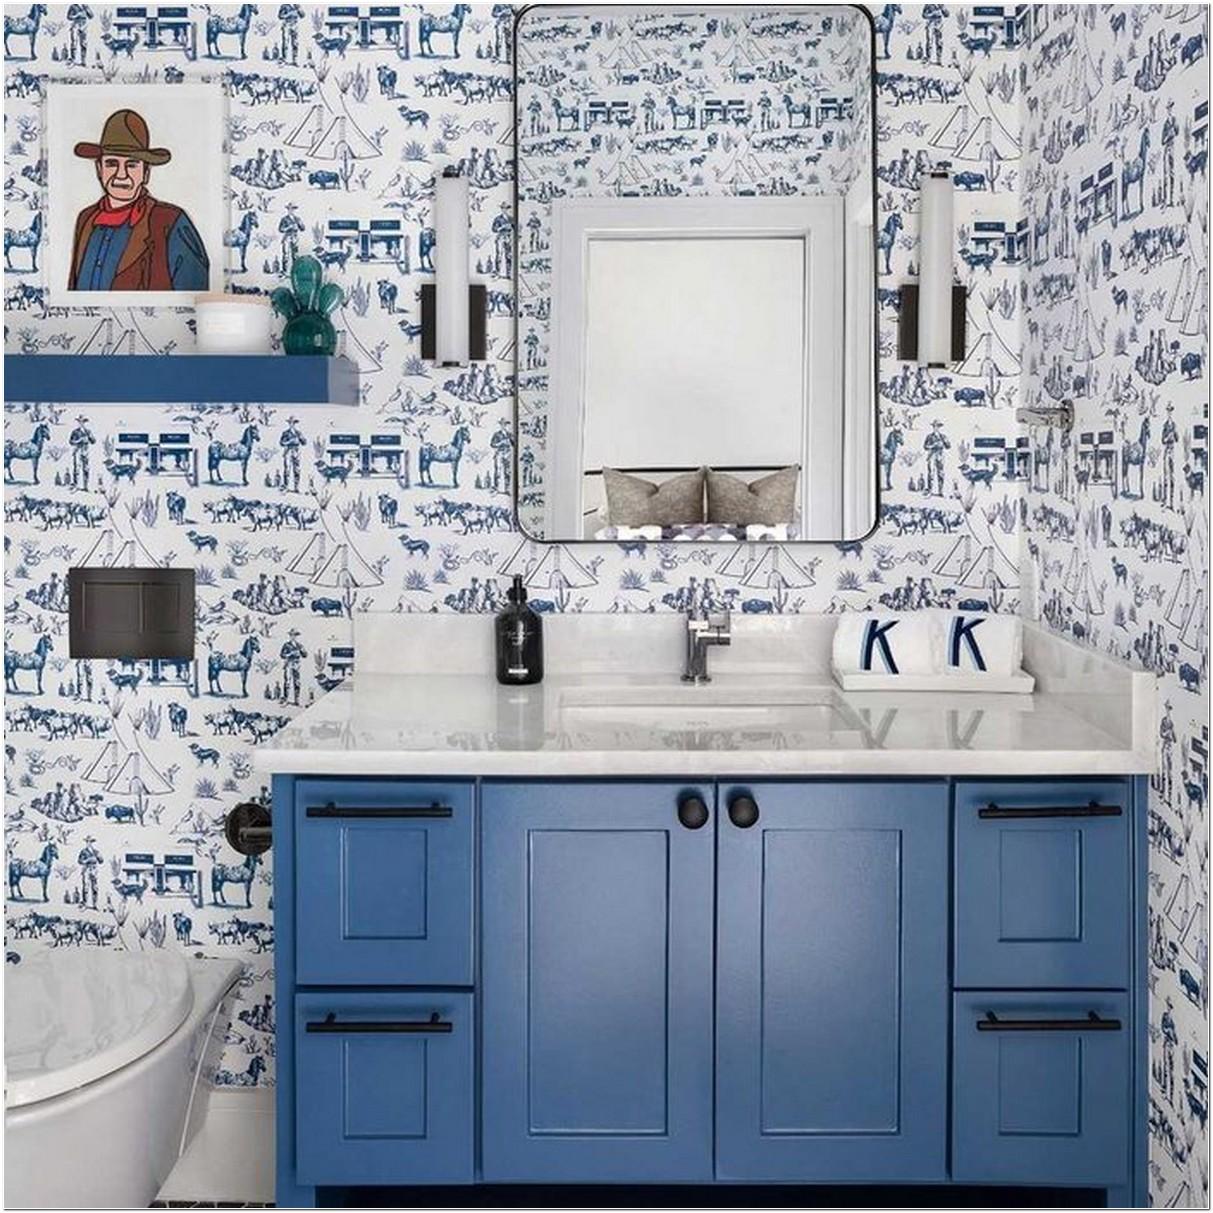 10 Best Kids Bathroom Decor Ideas 1